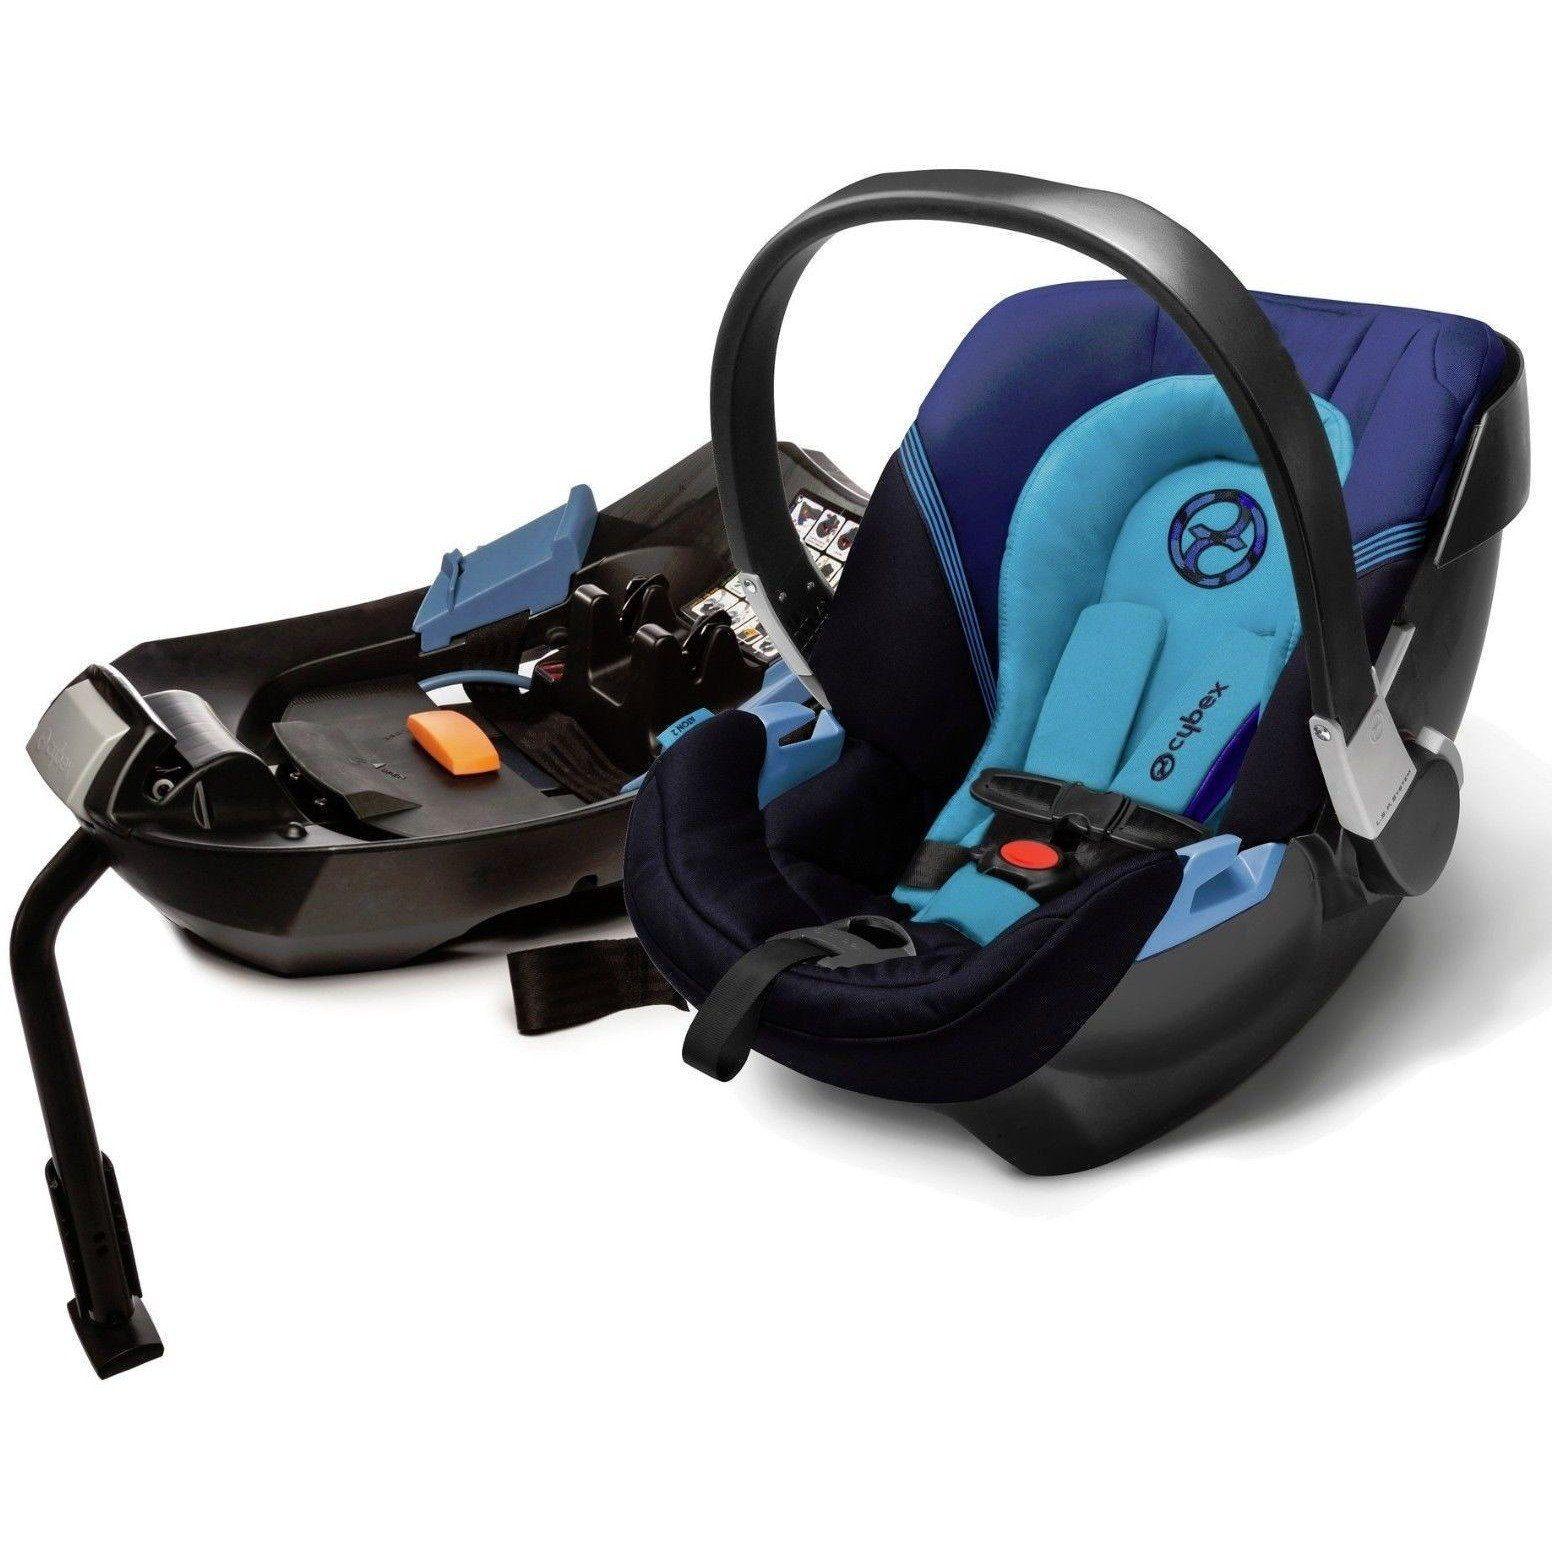 Cybex Aton 2 Infant Baby Car Seat Base W Load Leg True Blue NEW